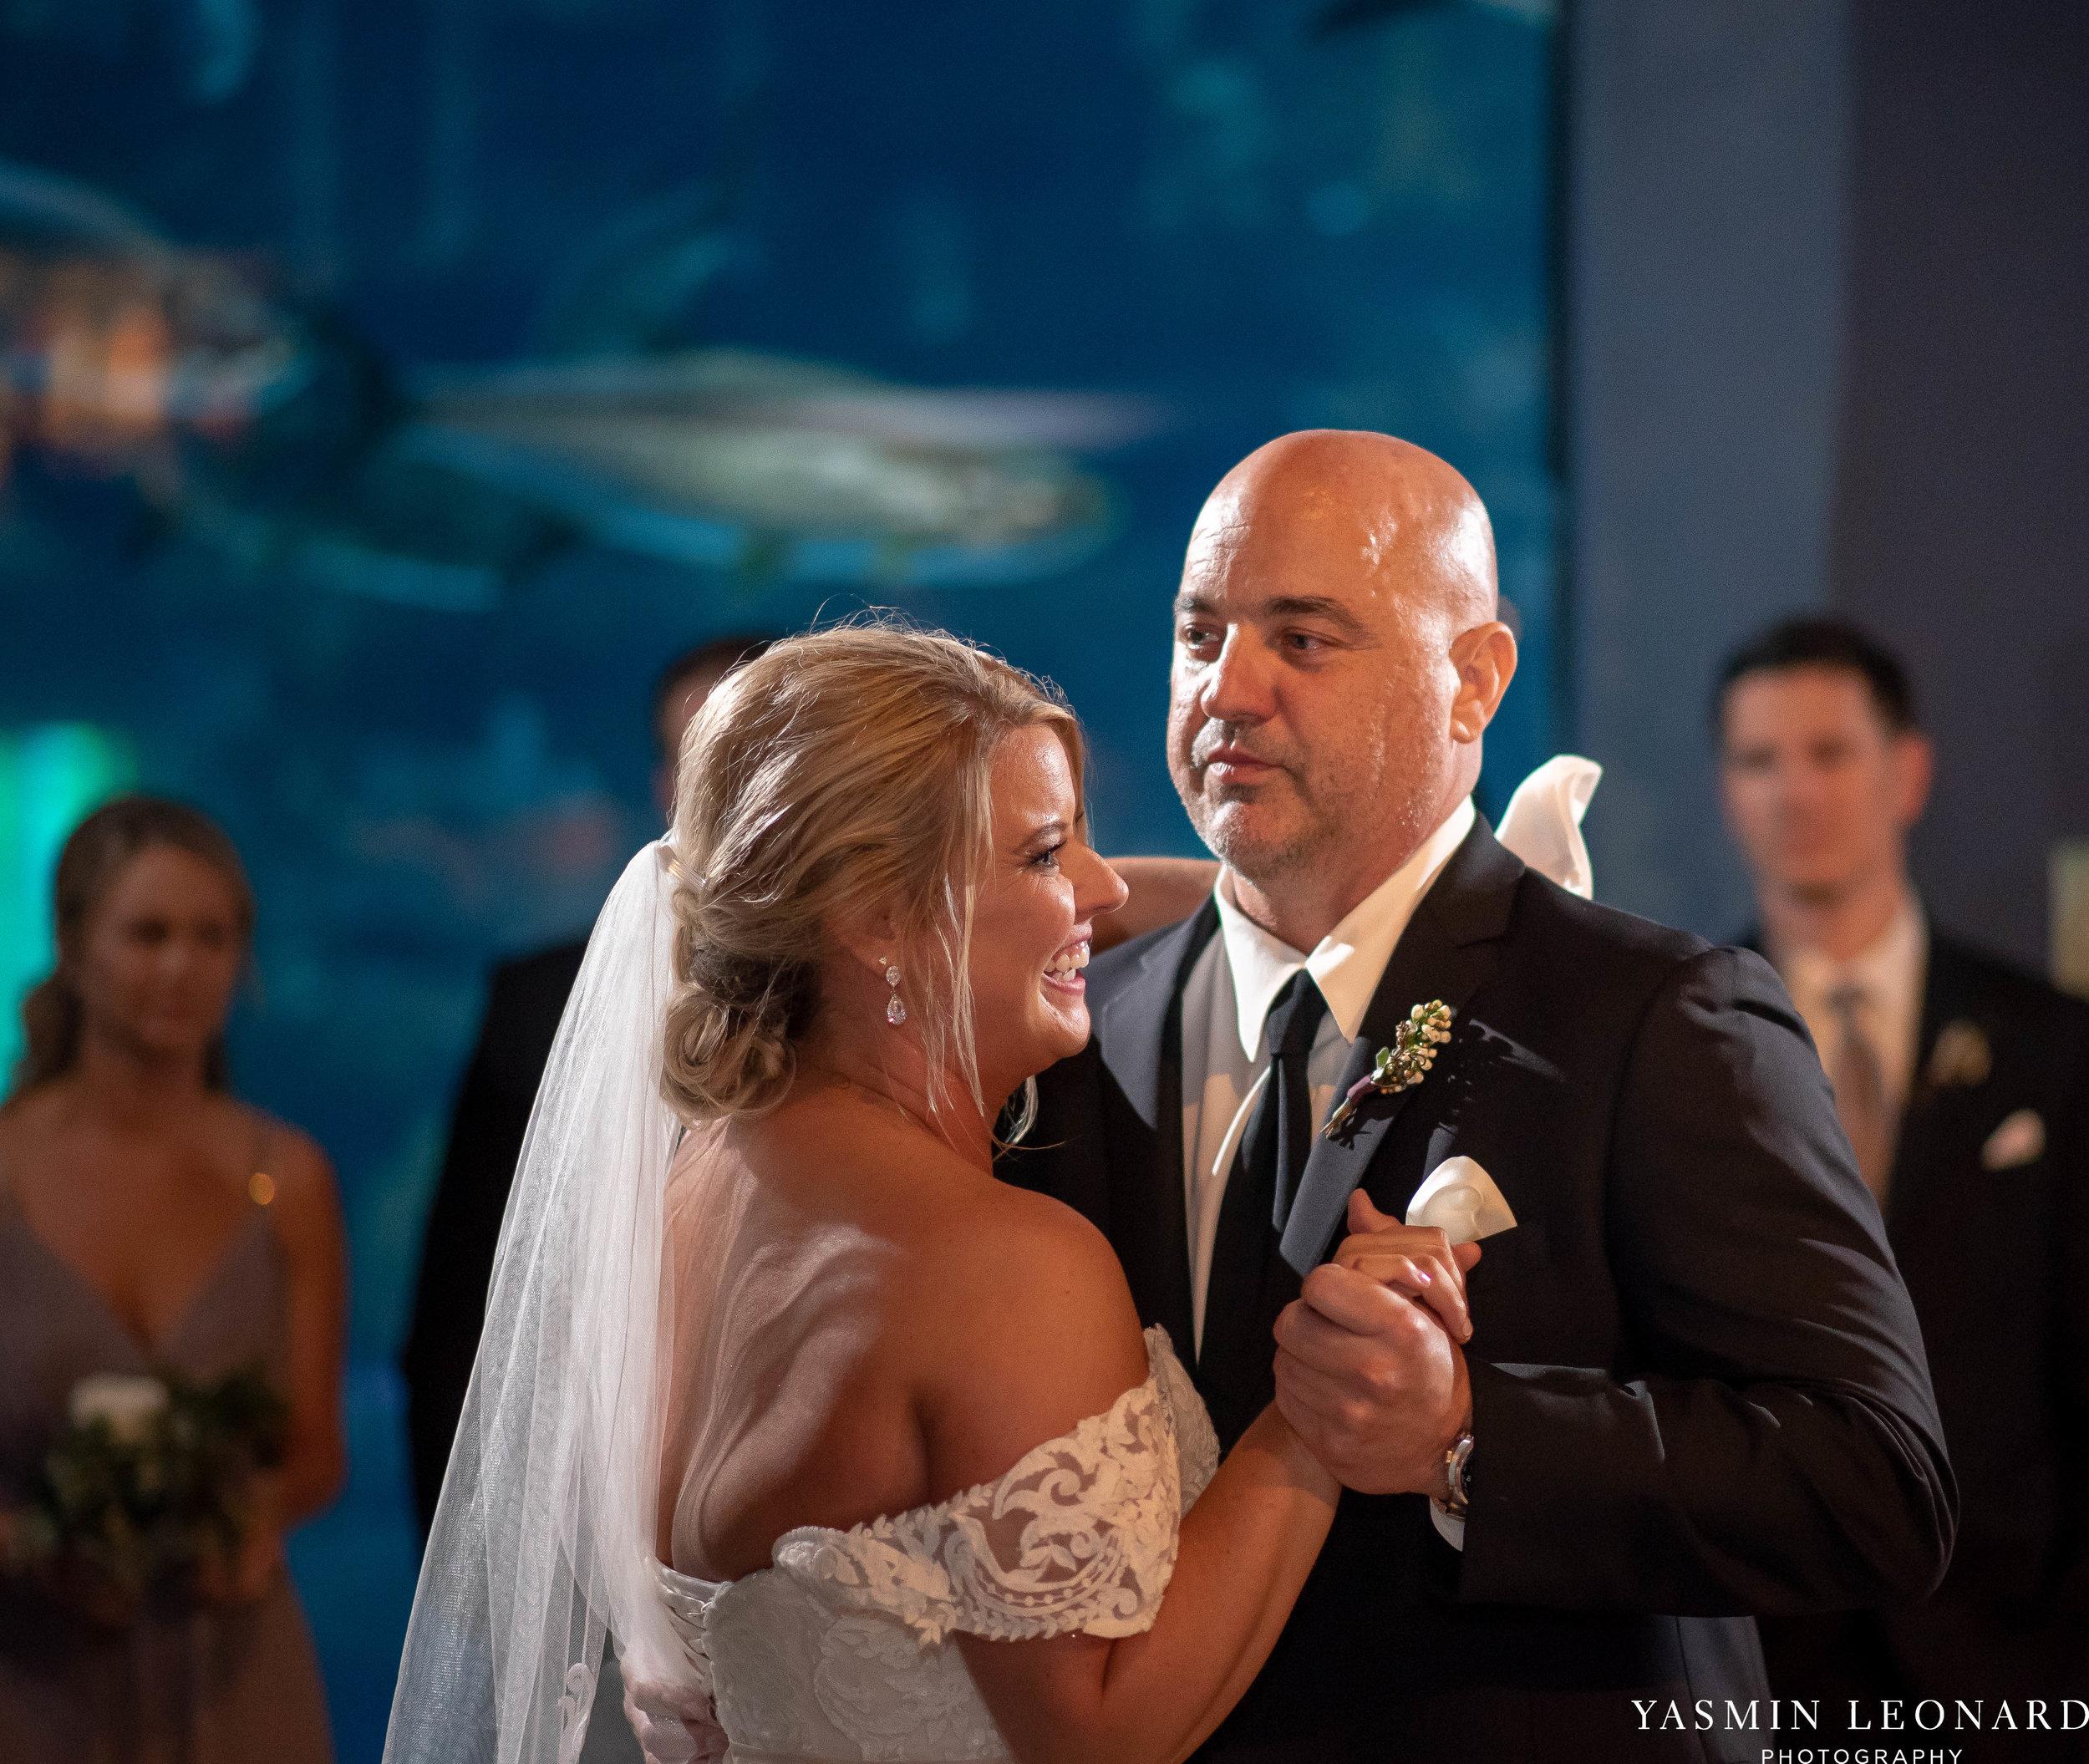 Carolina Beach Wedding - Fort Fisher Wedding - NC Acquarium - Beach Wedding - NC Wedding - Beach Wedding Inspiration - Beach Bride-45.jpg